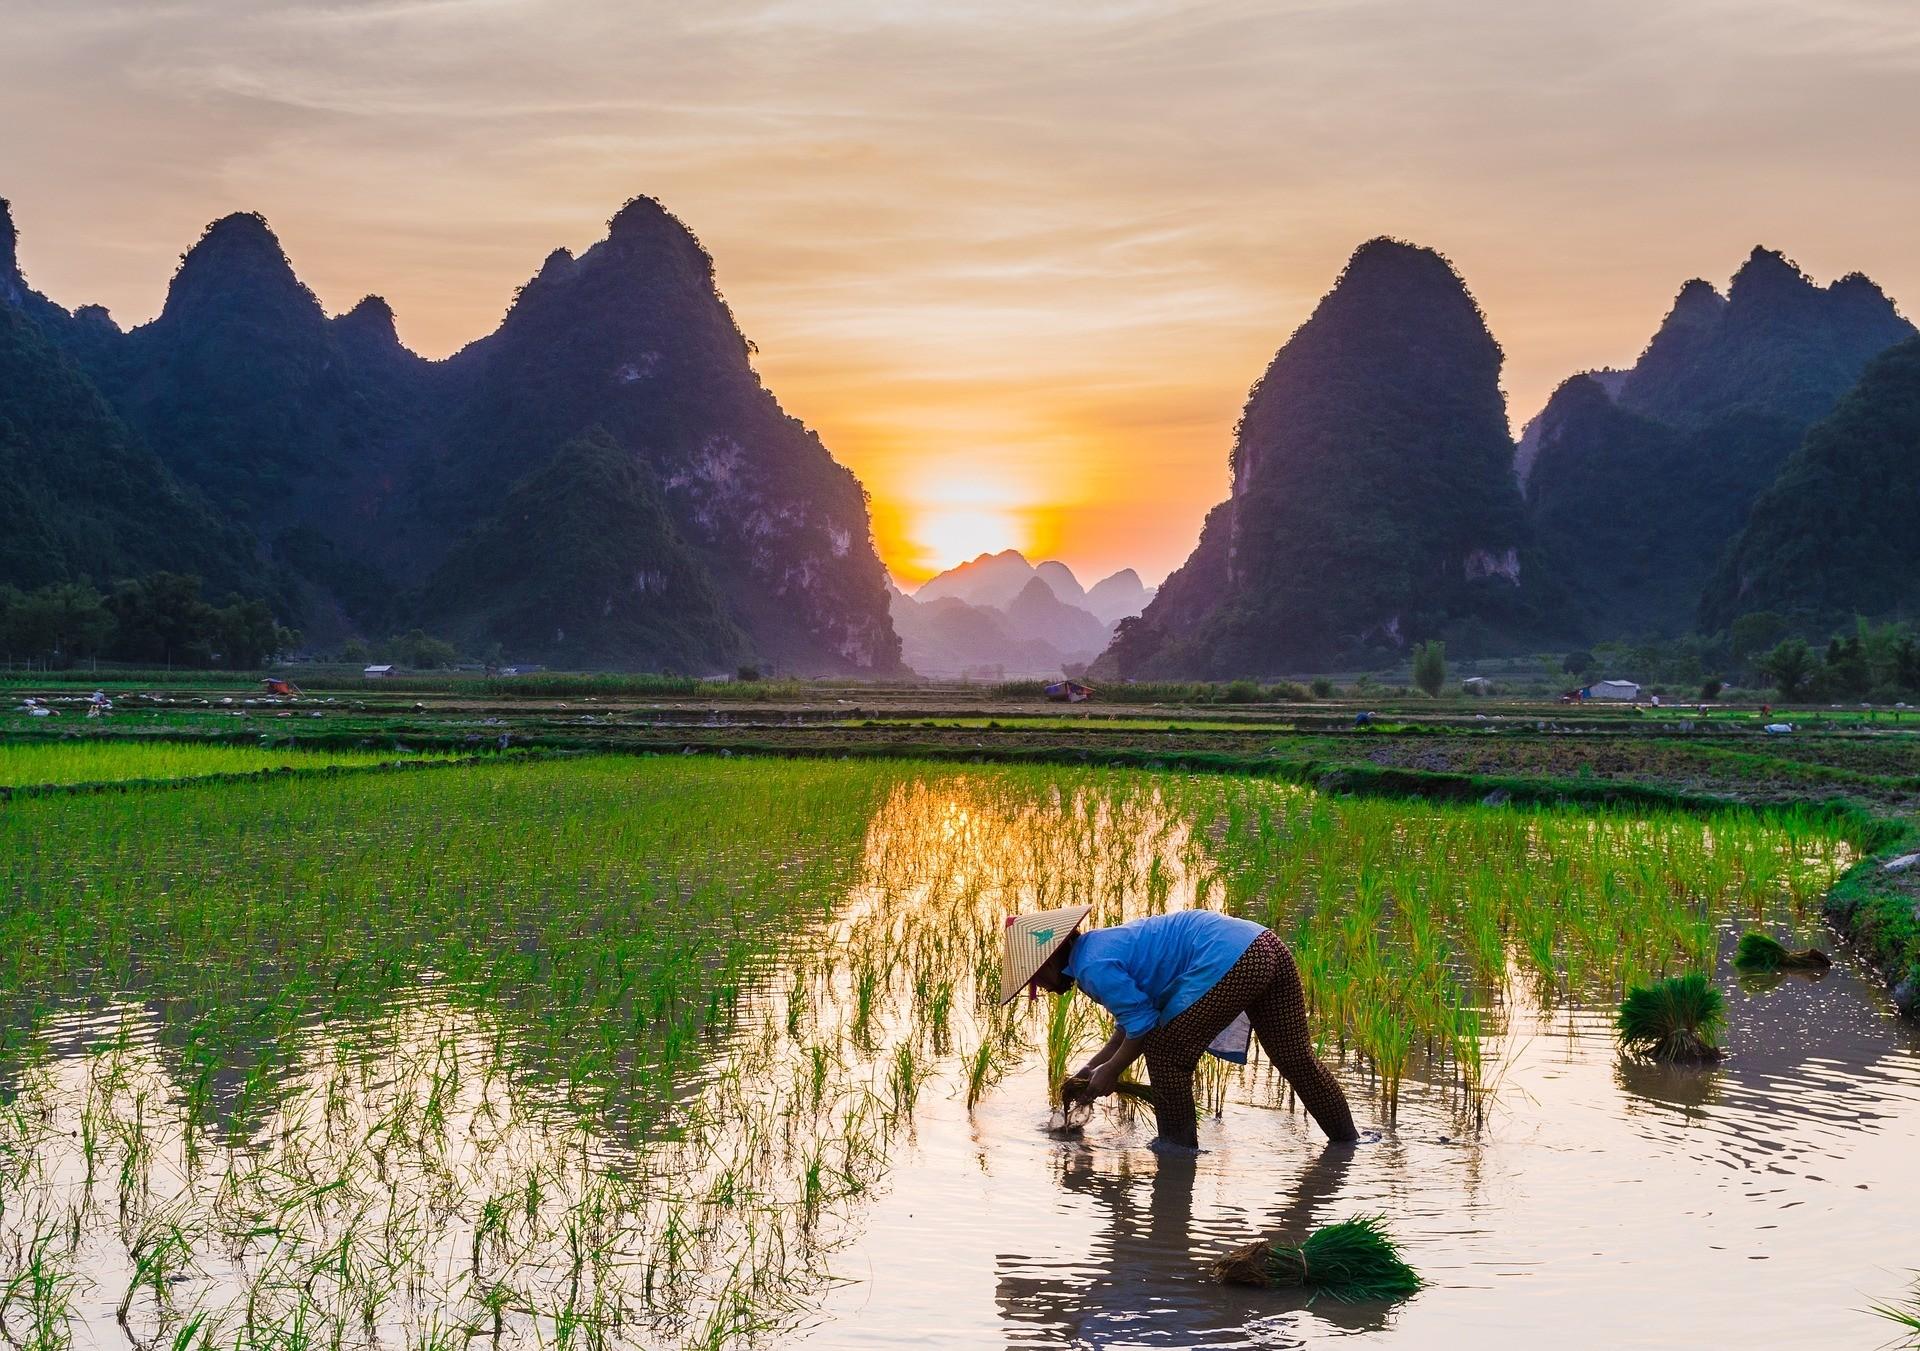 Food sustainability farming farm rice